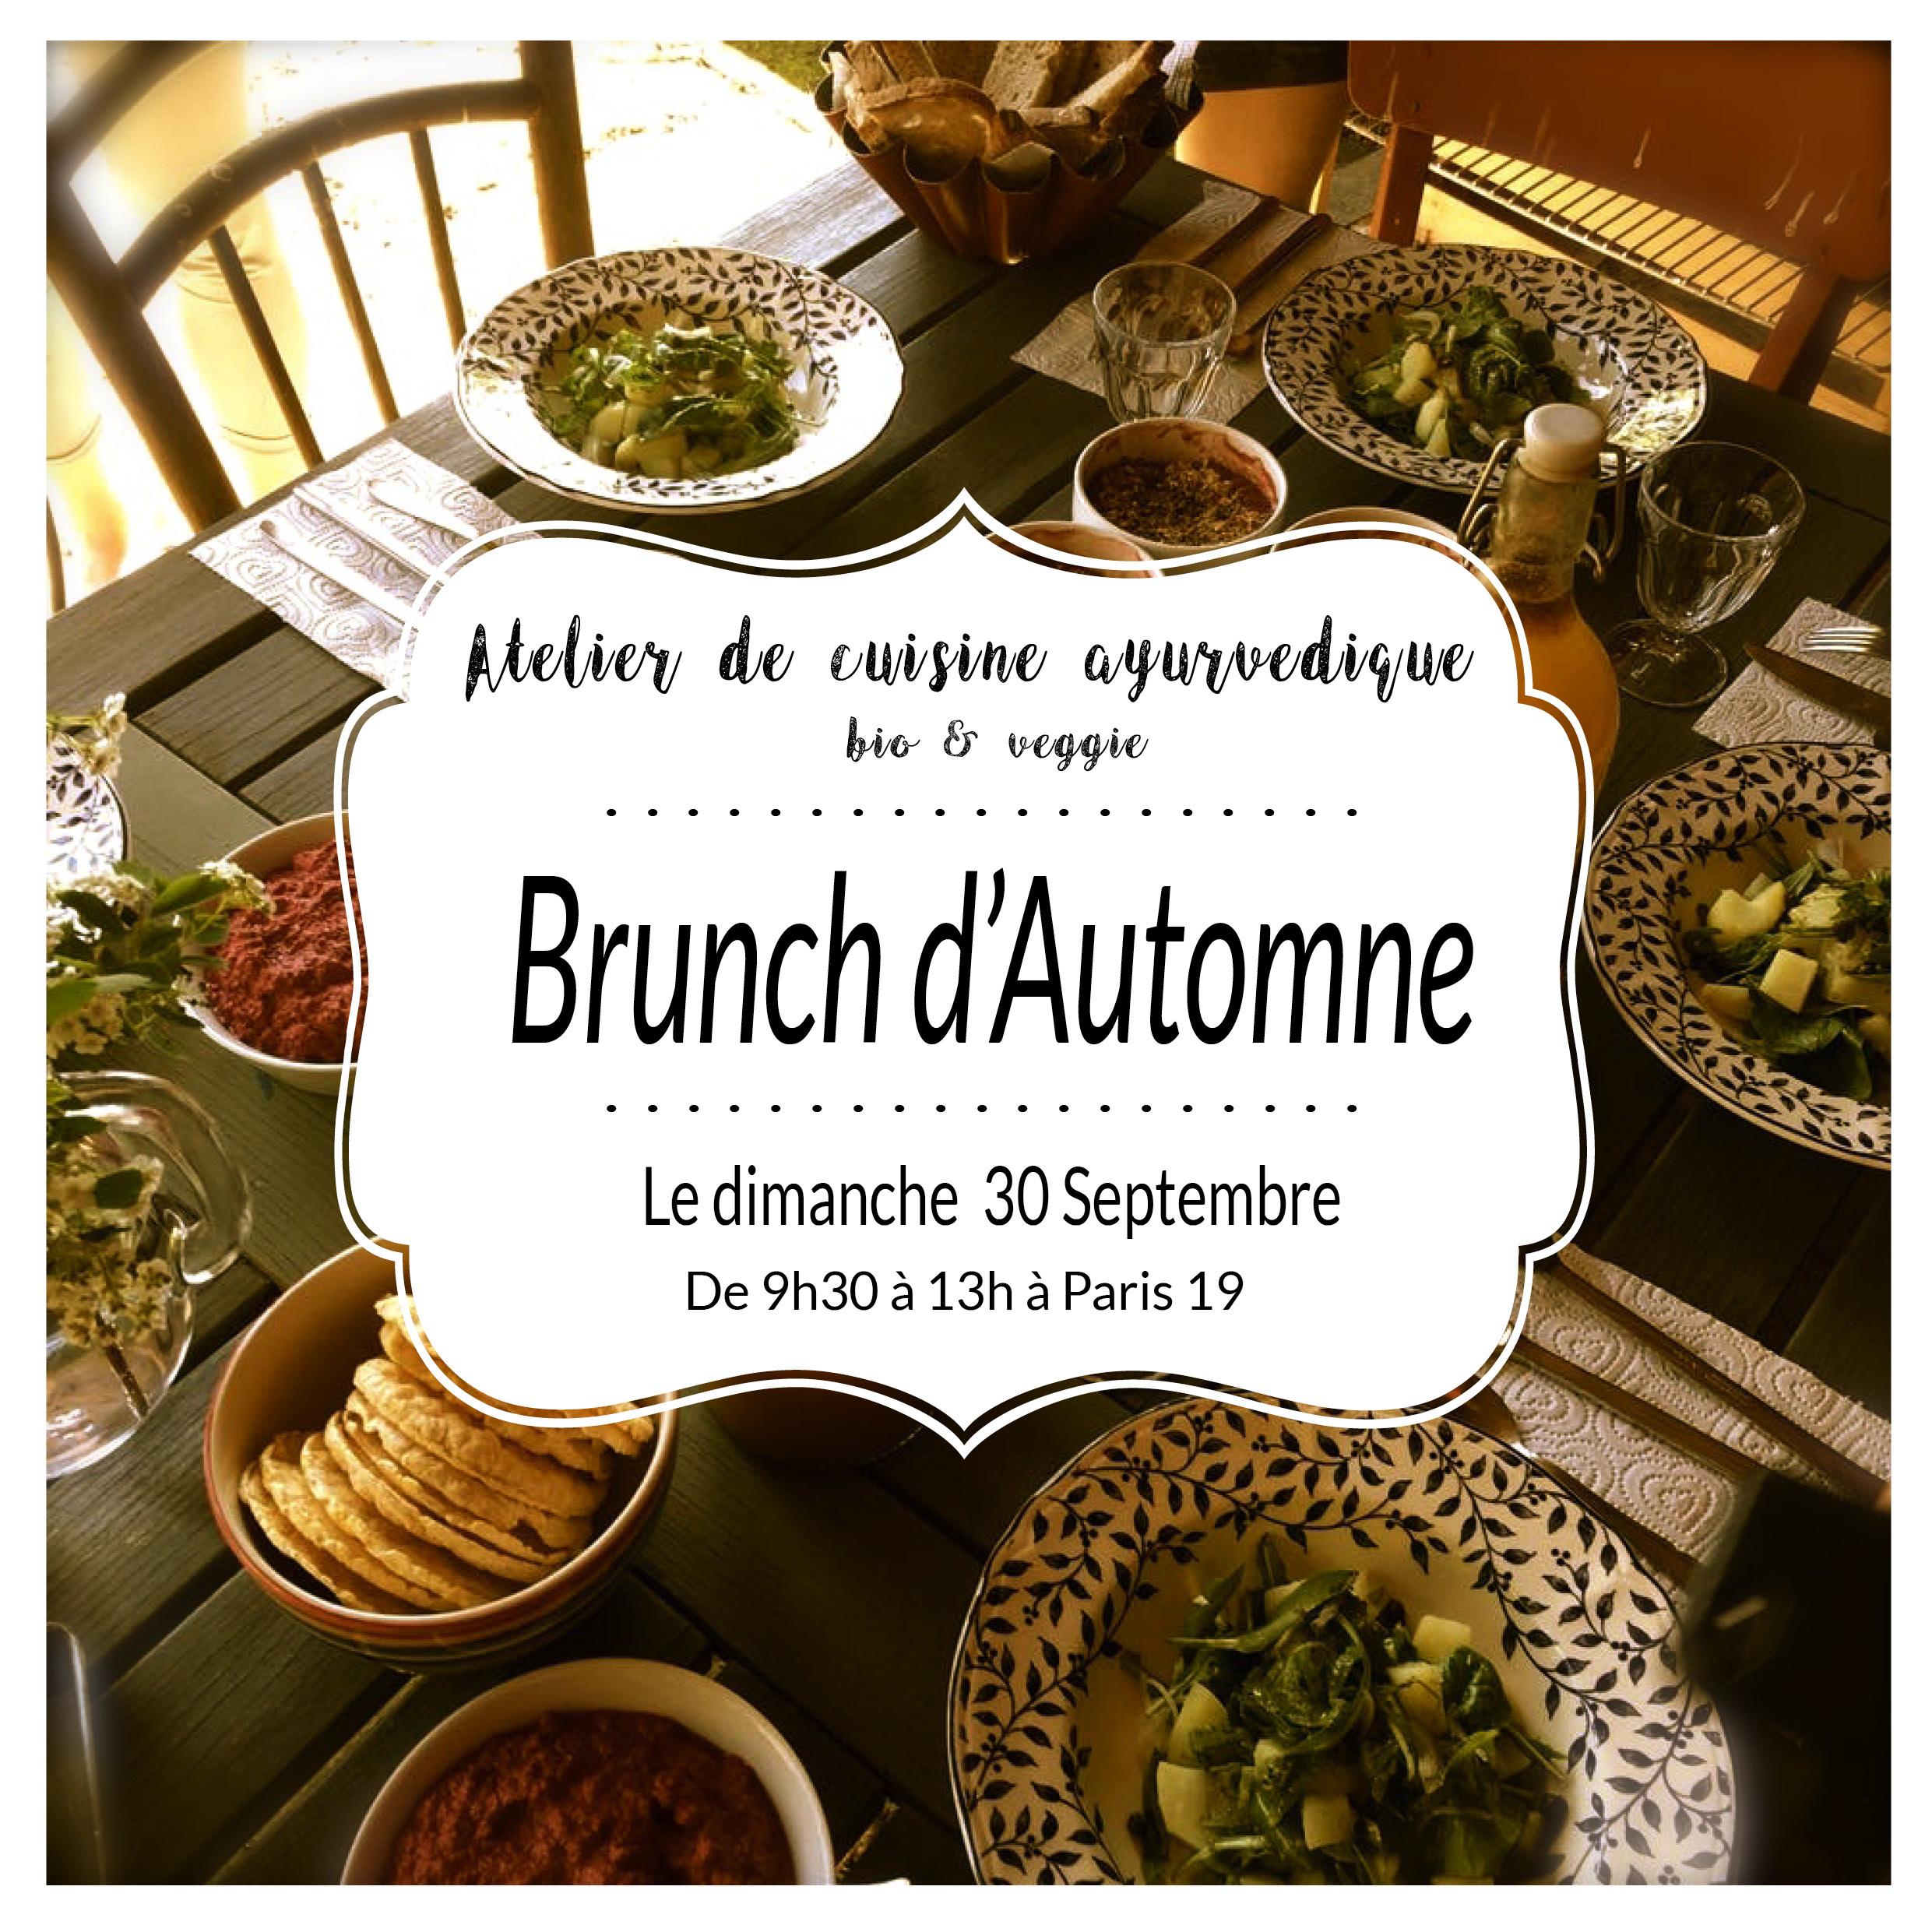 cours-cuisine-ayurvedique-vegan-vegetarienne-recette-brunch-paris-19.jpg